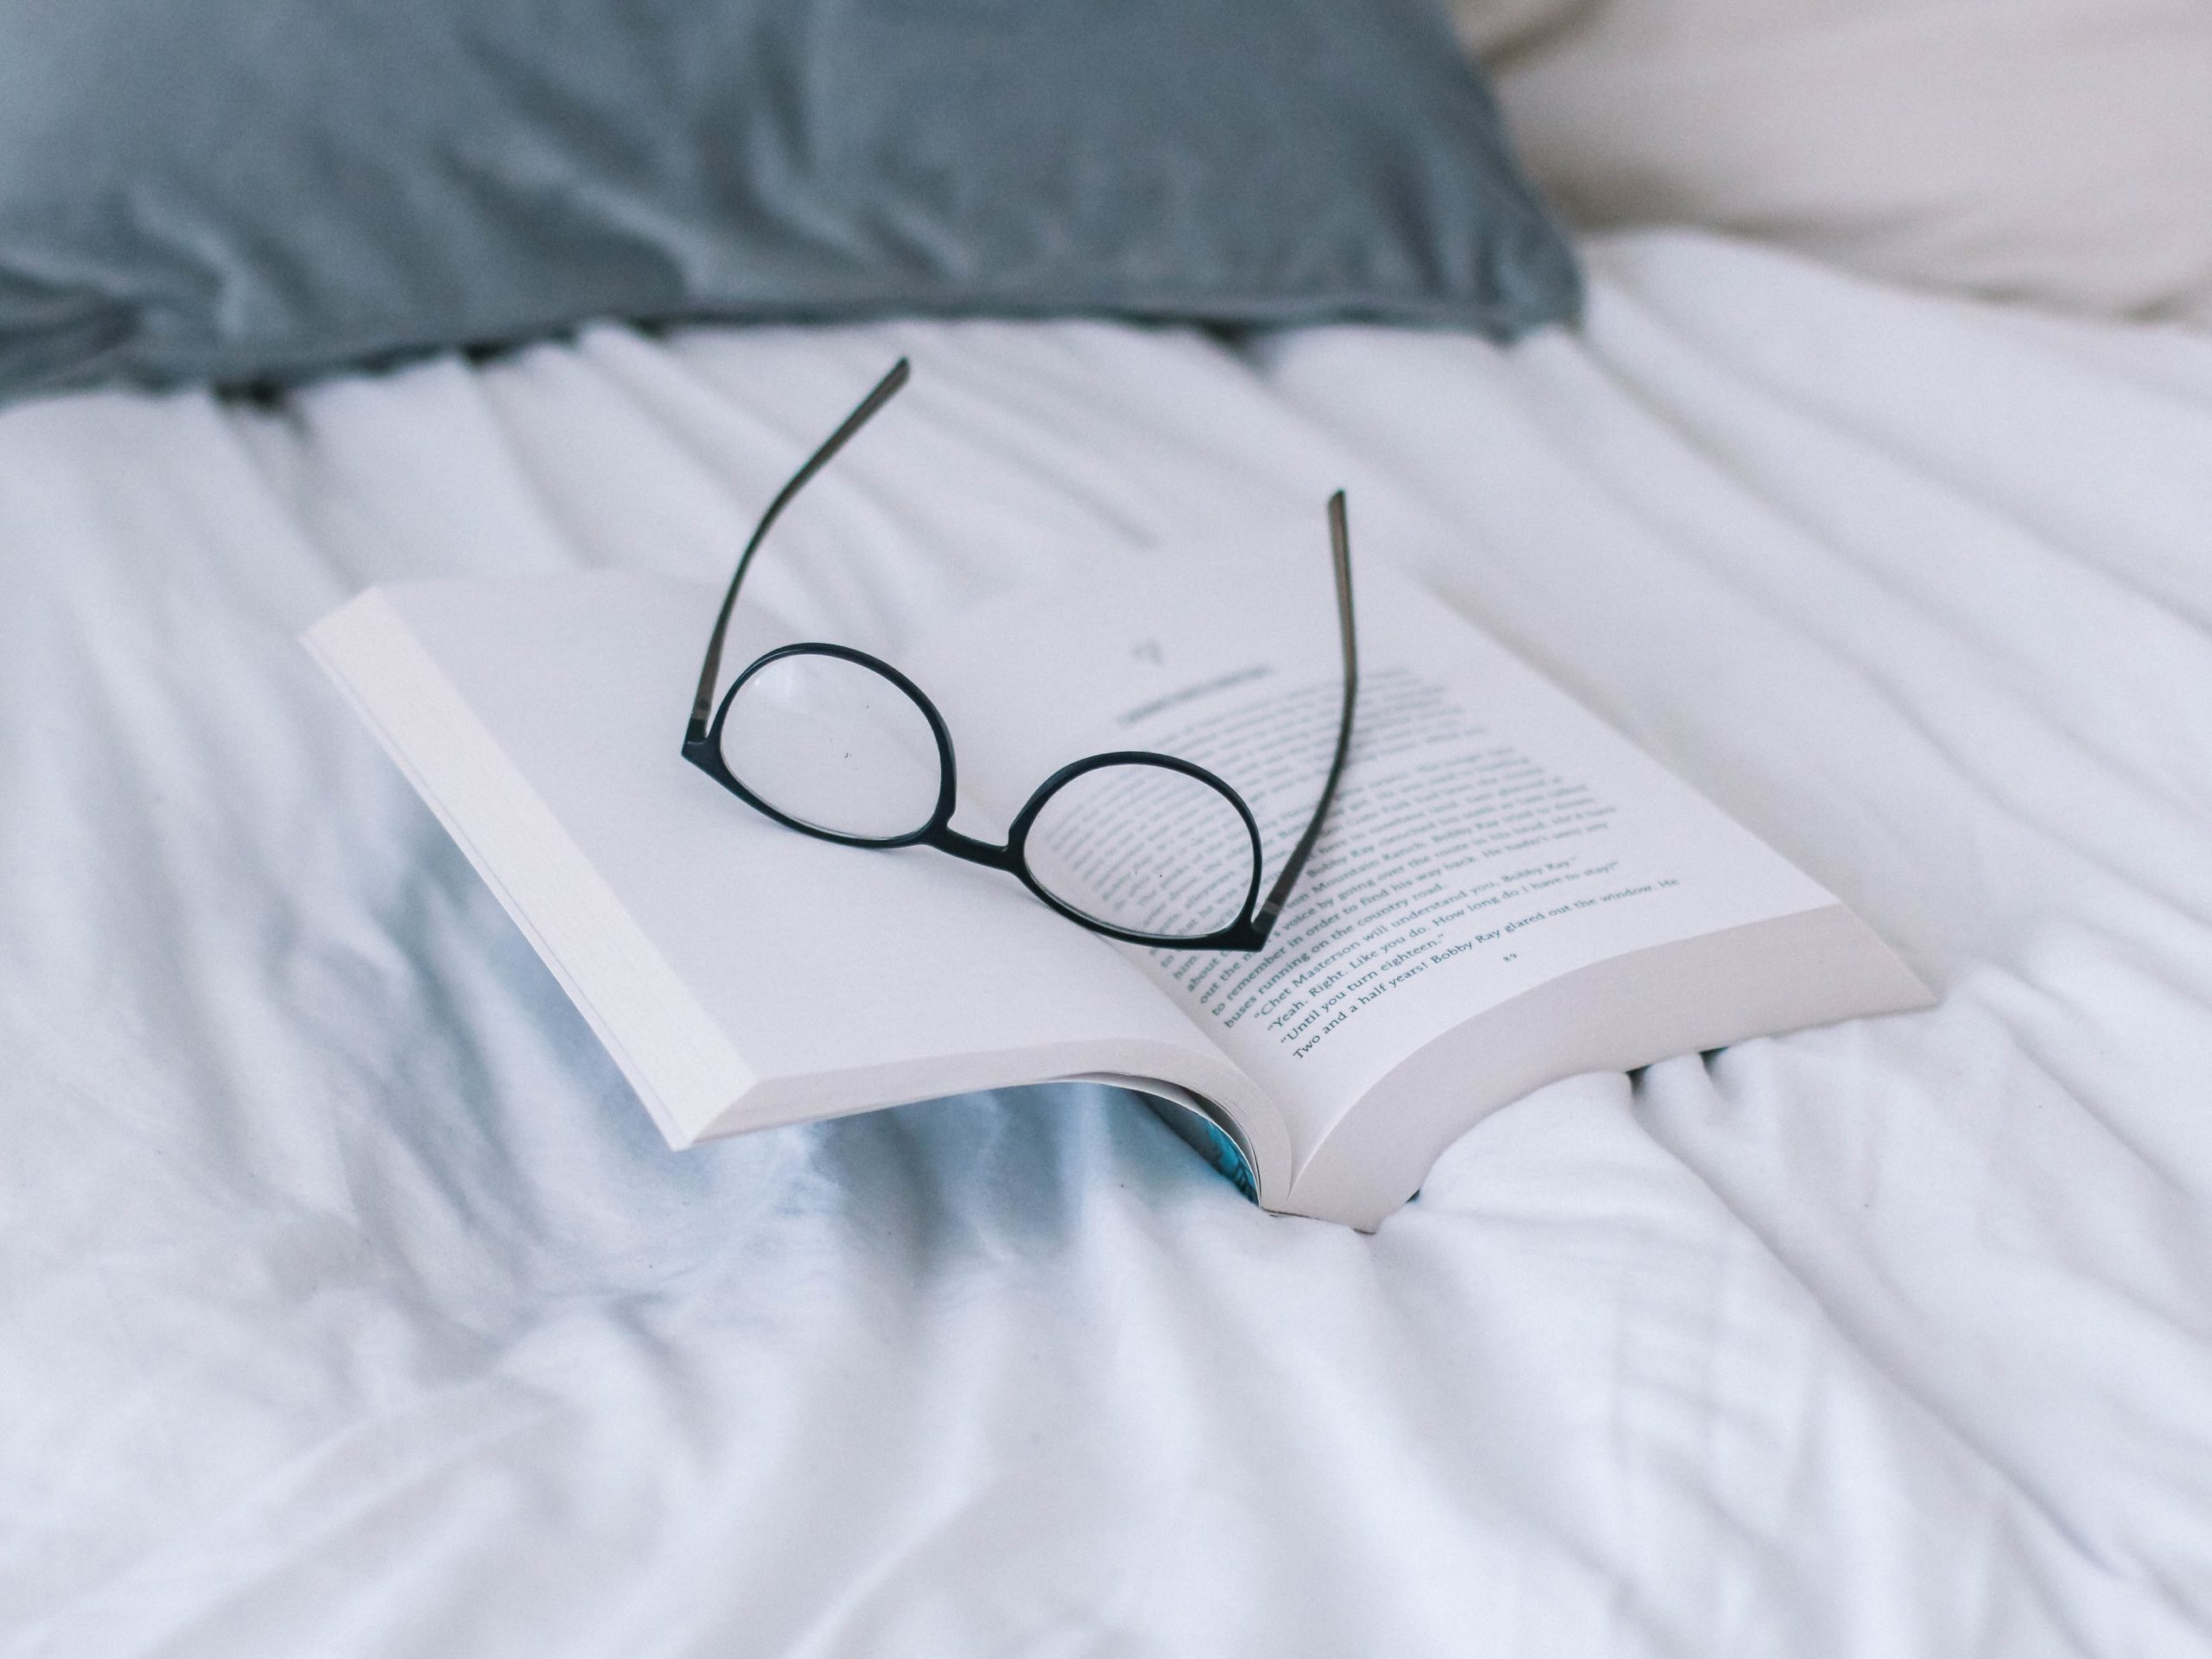 Books || Books to read maart 2021 deel 2